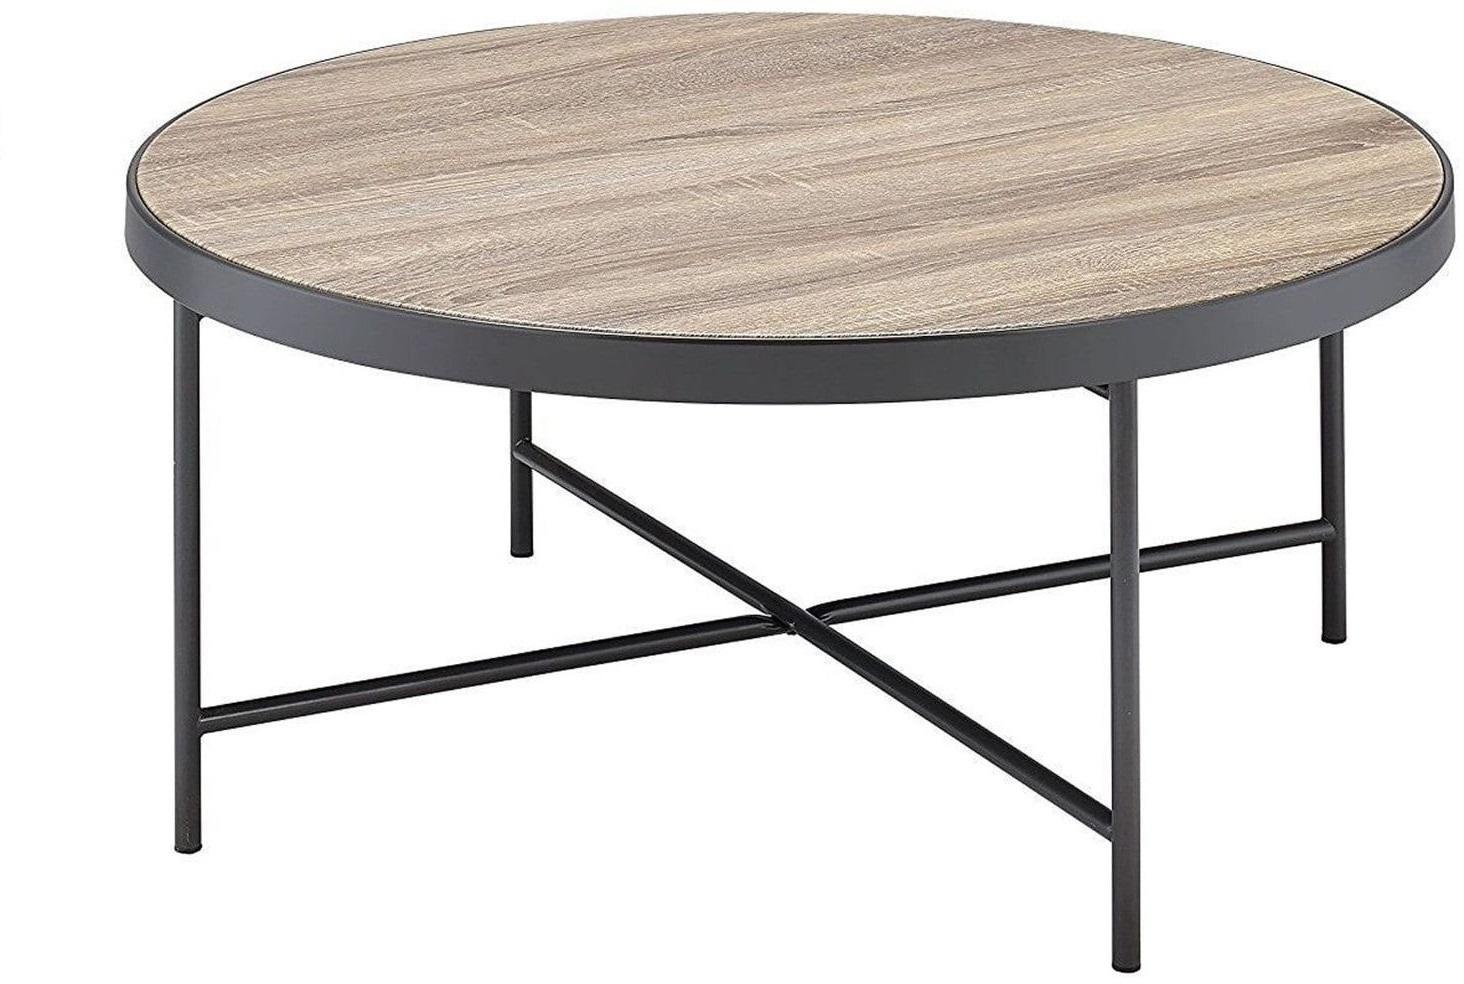 "32.3"" X 32.3"" X 15.75"" Weathered Gray Oak Coffee Table"